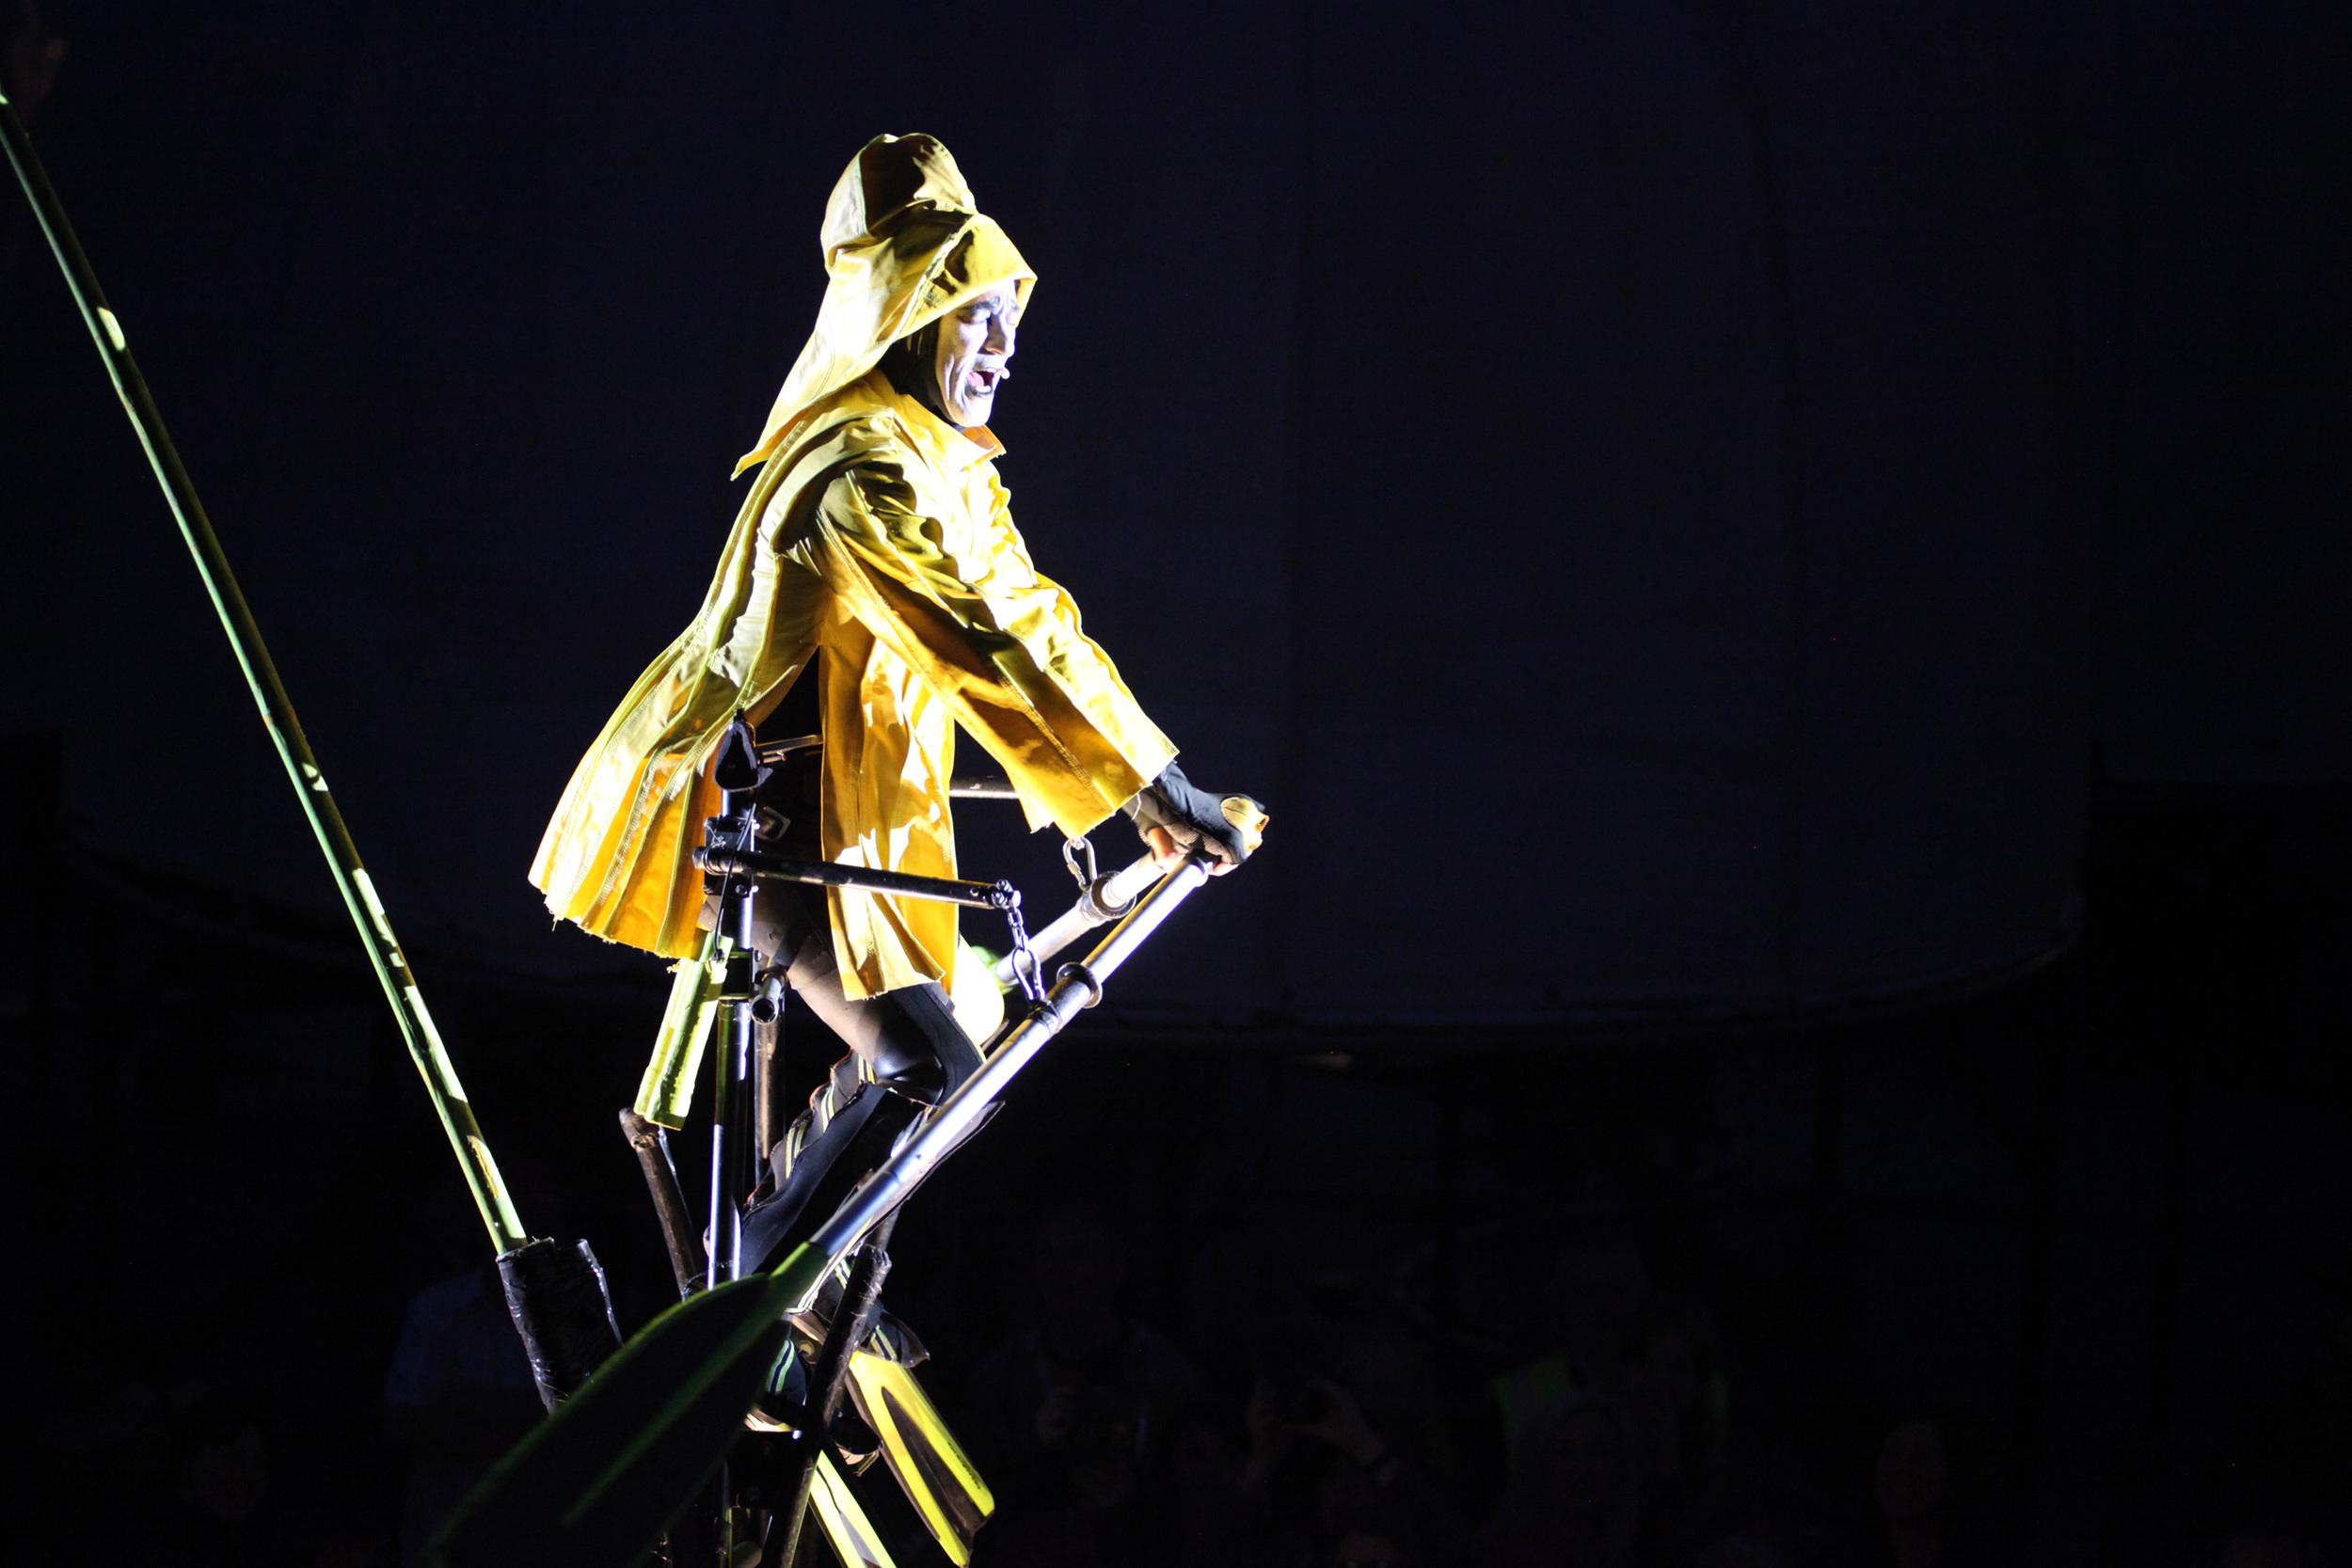 Sat'day night performance_Dan1_20120623_034.jpg